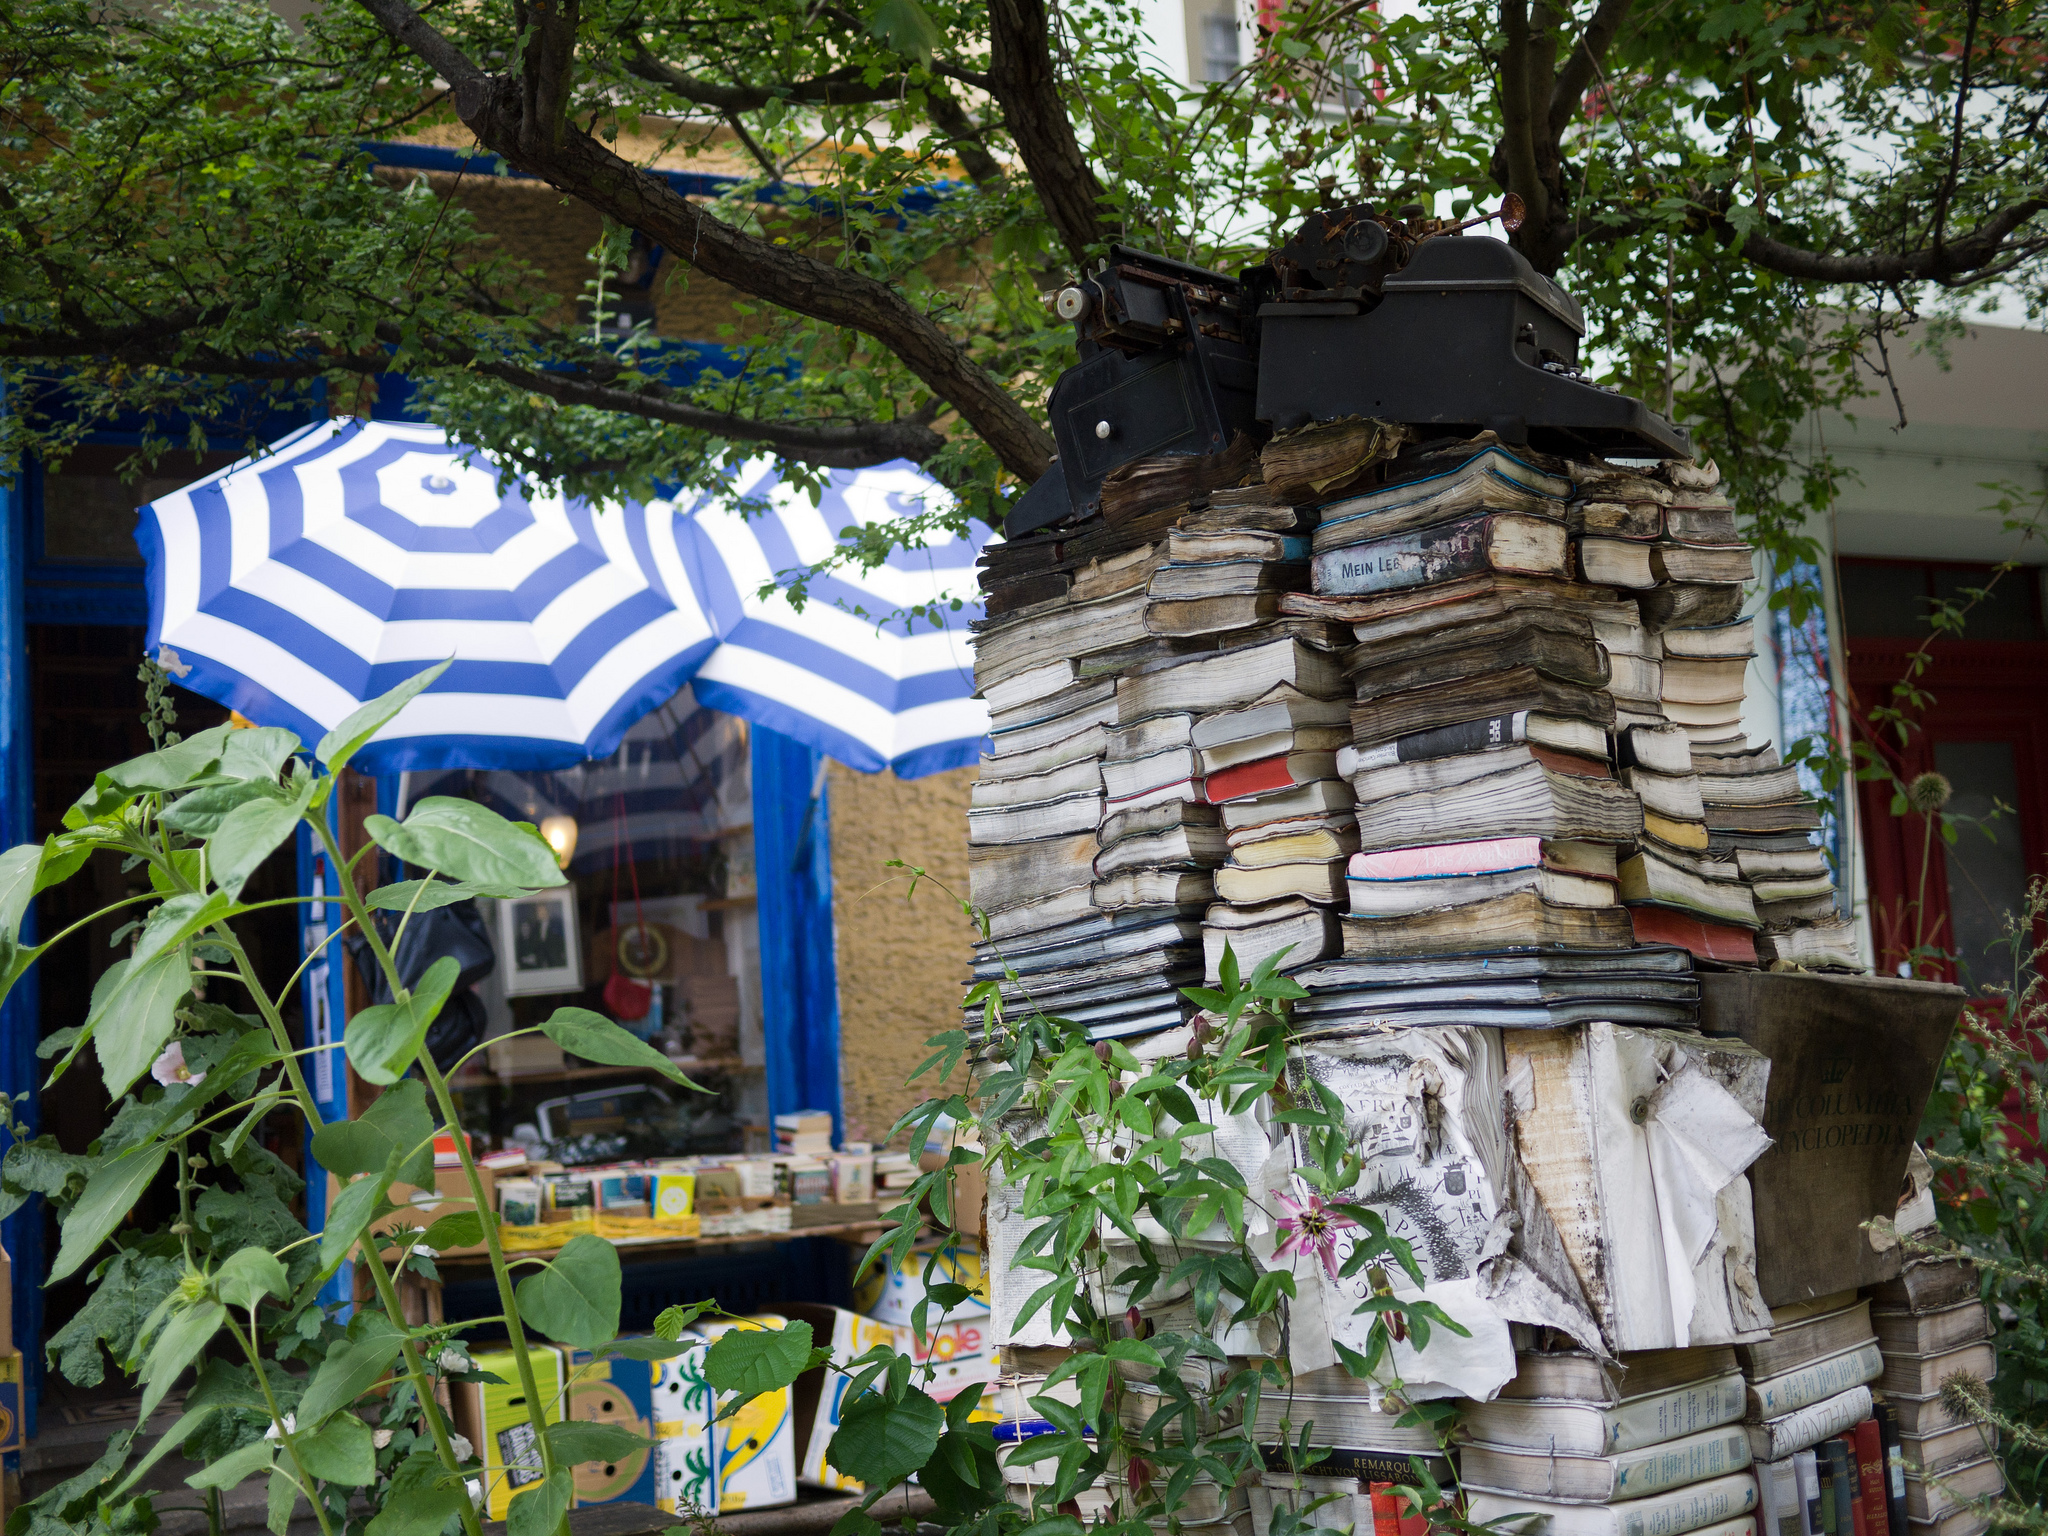 Berlin Outdoor Book Shelf  ©R4vi/Flickr